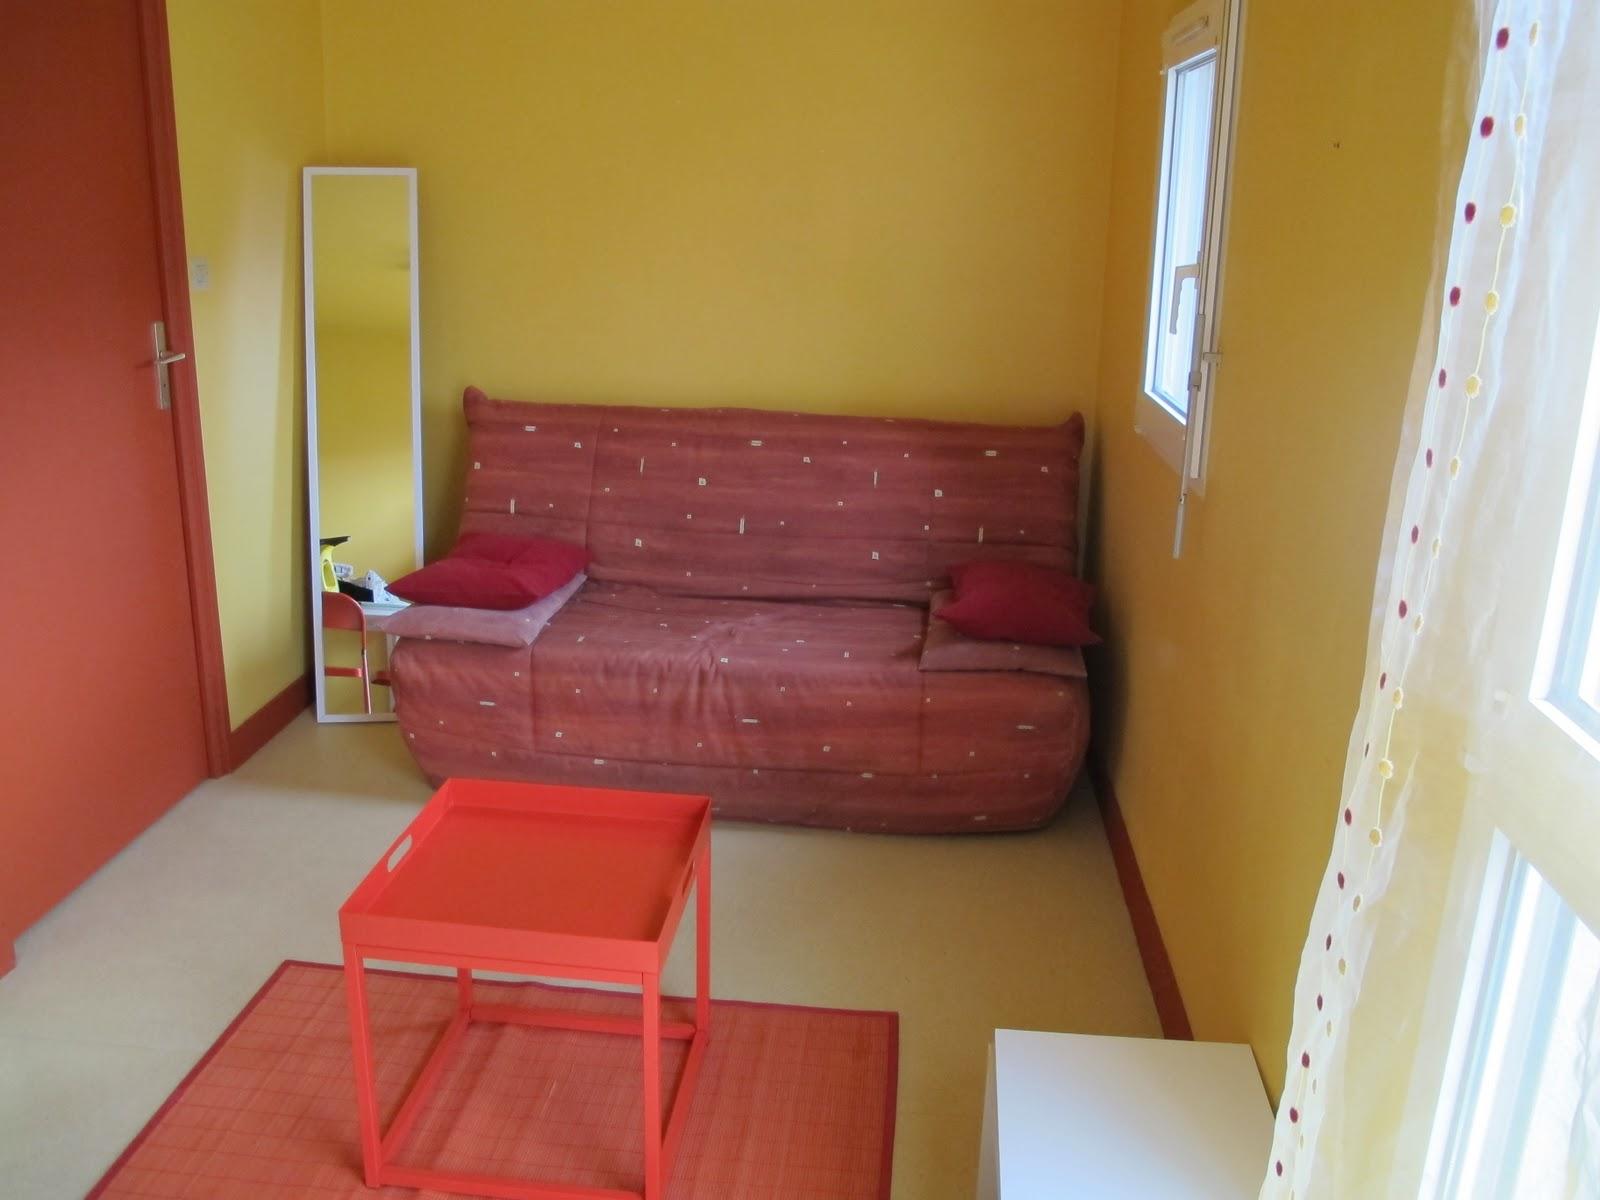 location studios vannes studio n 11 10 avenue de suffren. Black Bedroom Furniture Sets. Home Design Ideas